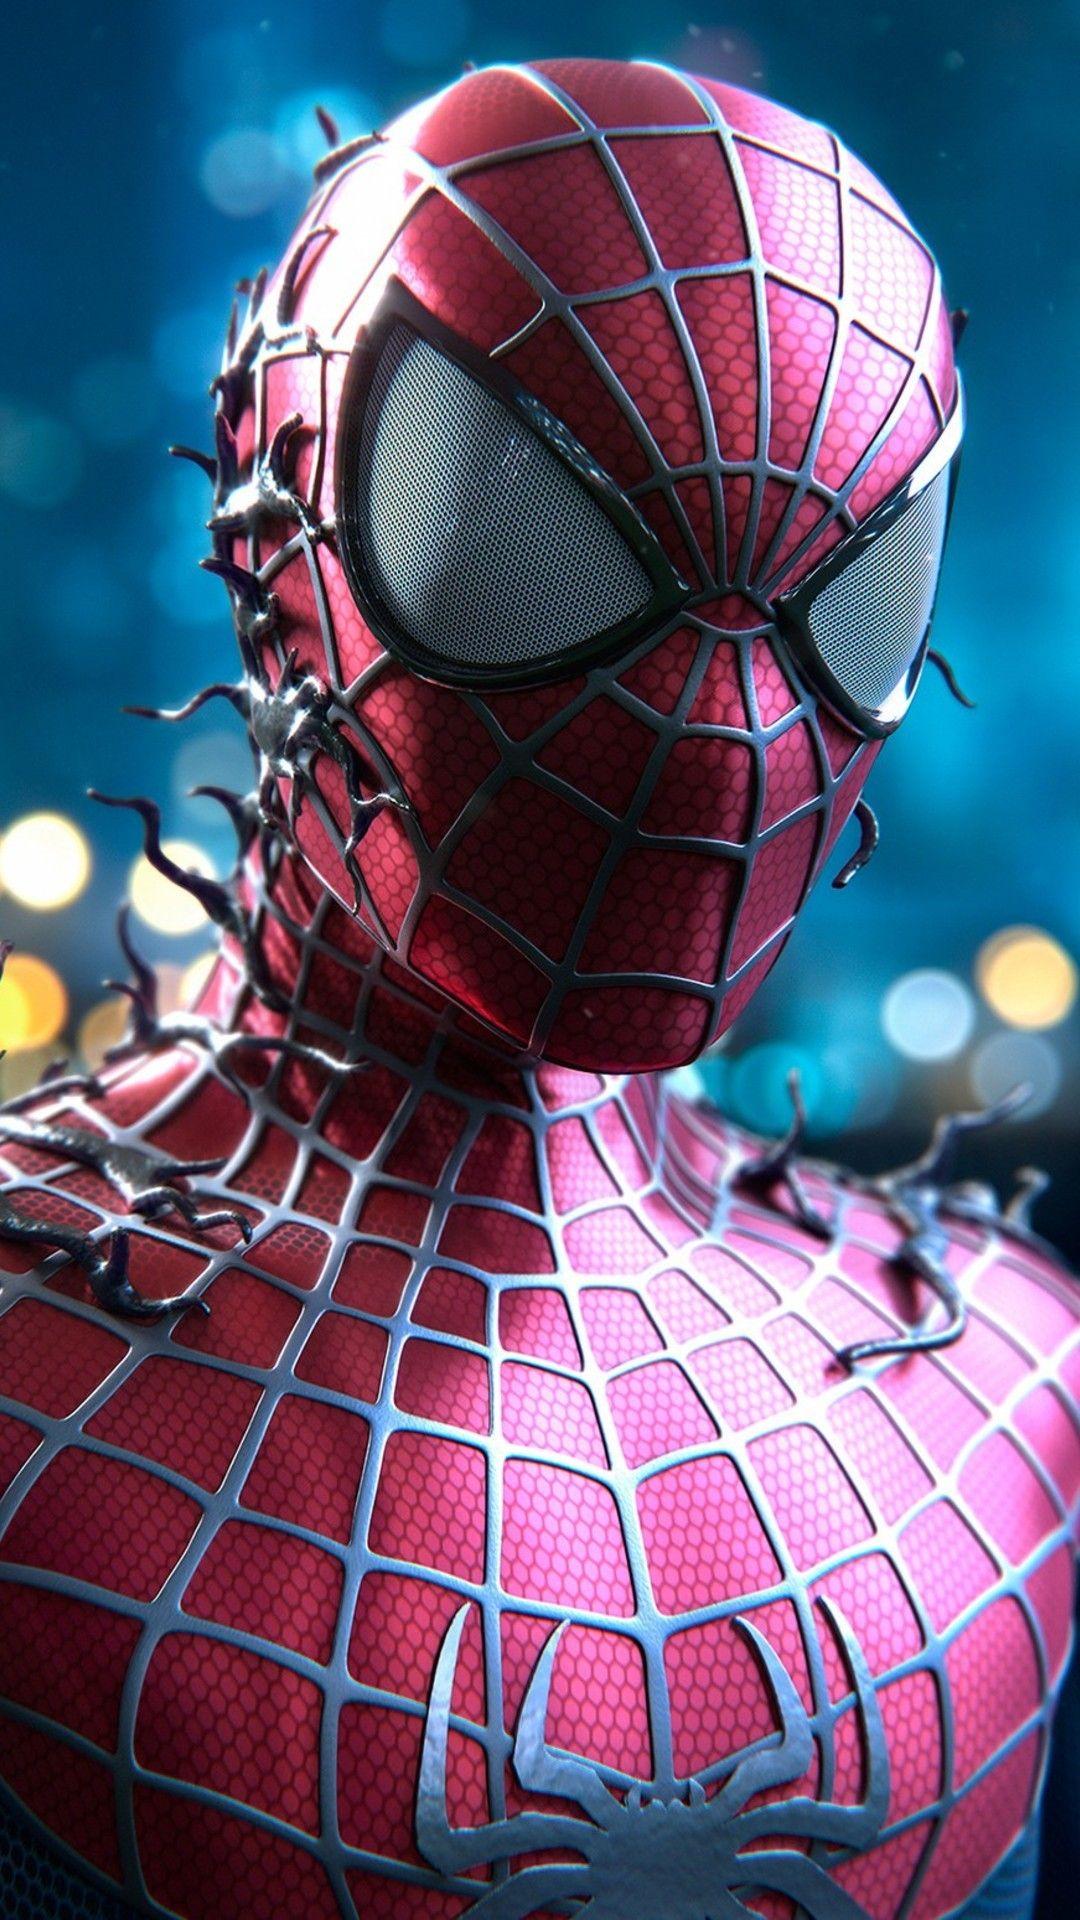 Mobile Wallpapers 4k Hombre Arana Comic Spiderman Personajes Spiderman Dibujos Animados